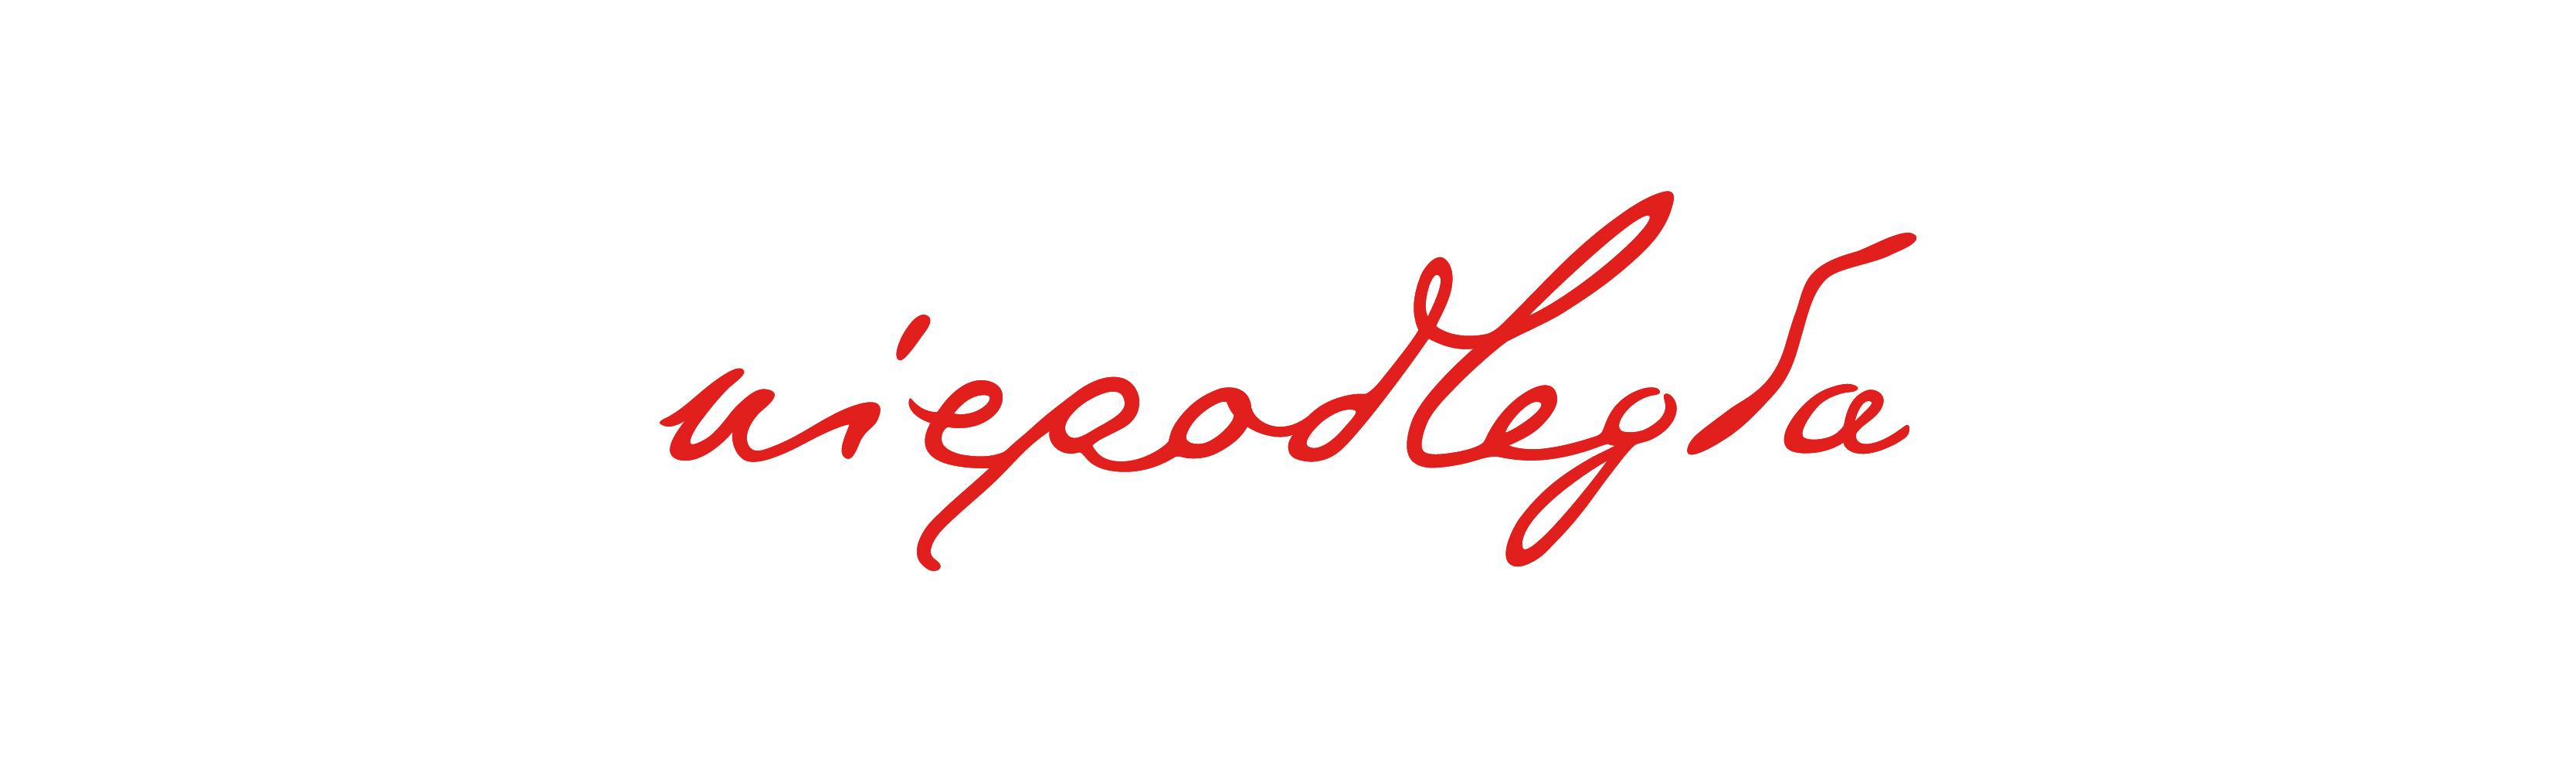 logo pl skrocony